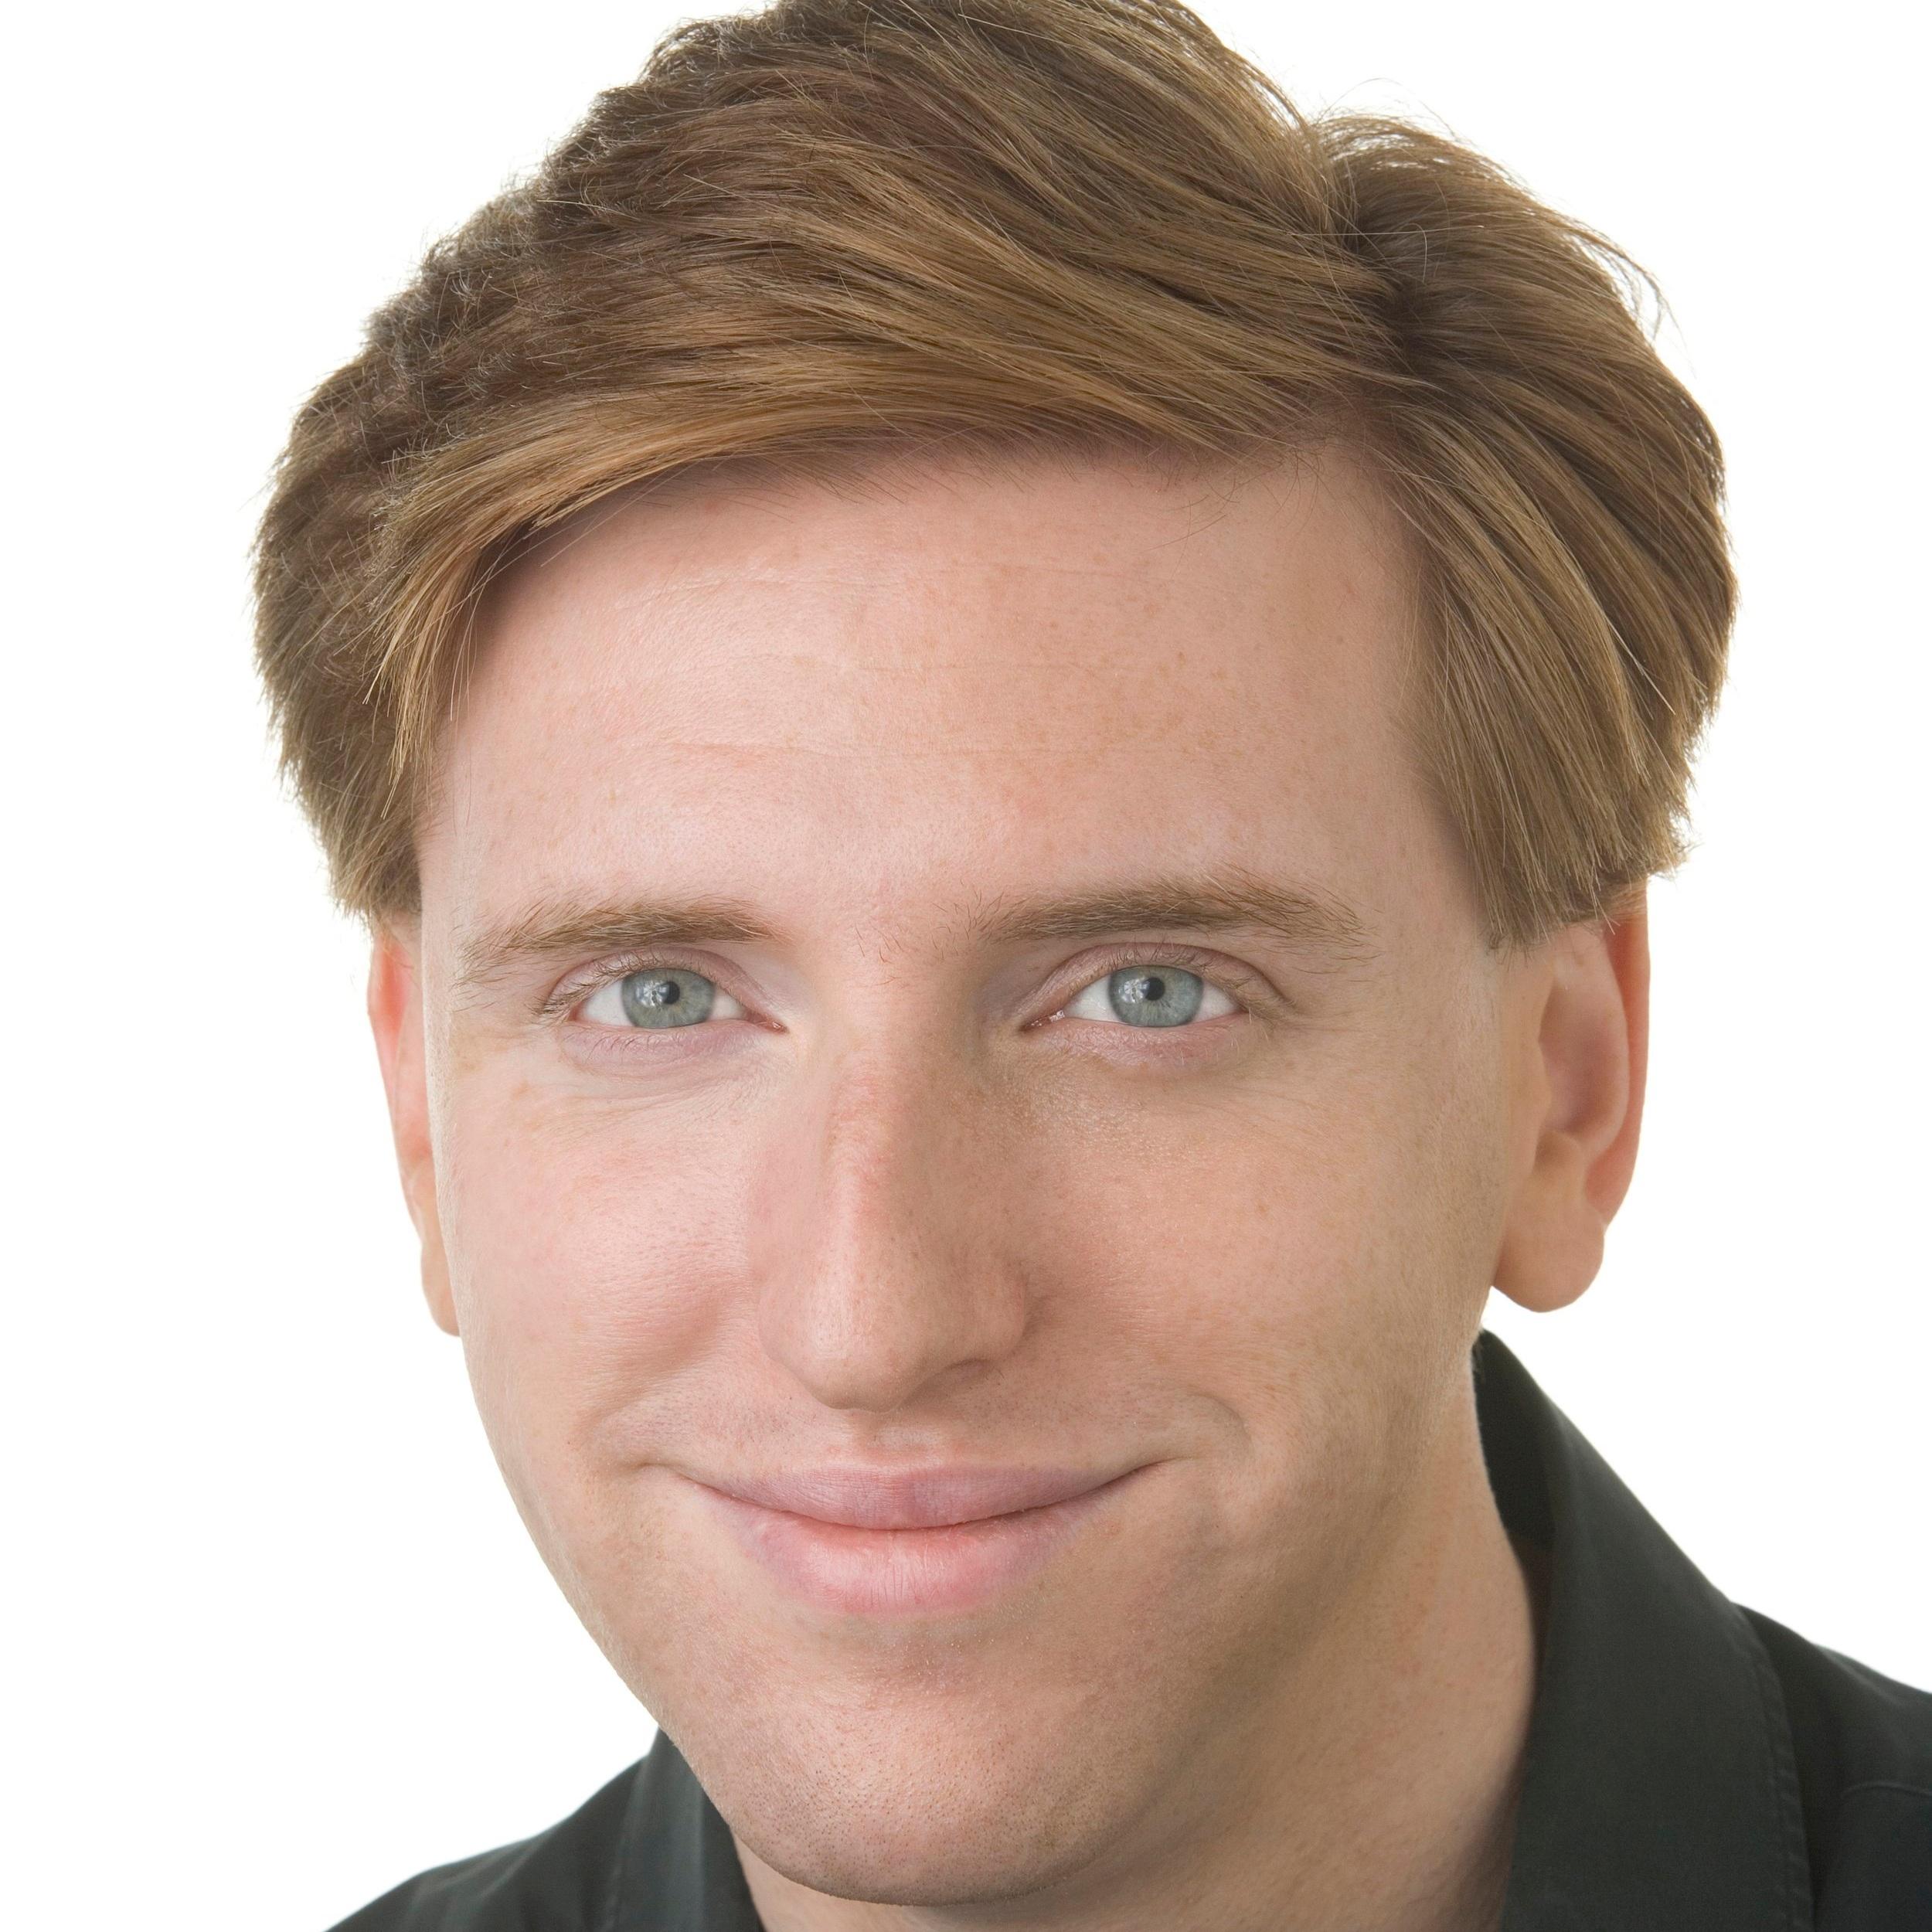 Pianist David Hanlon